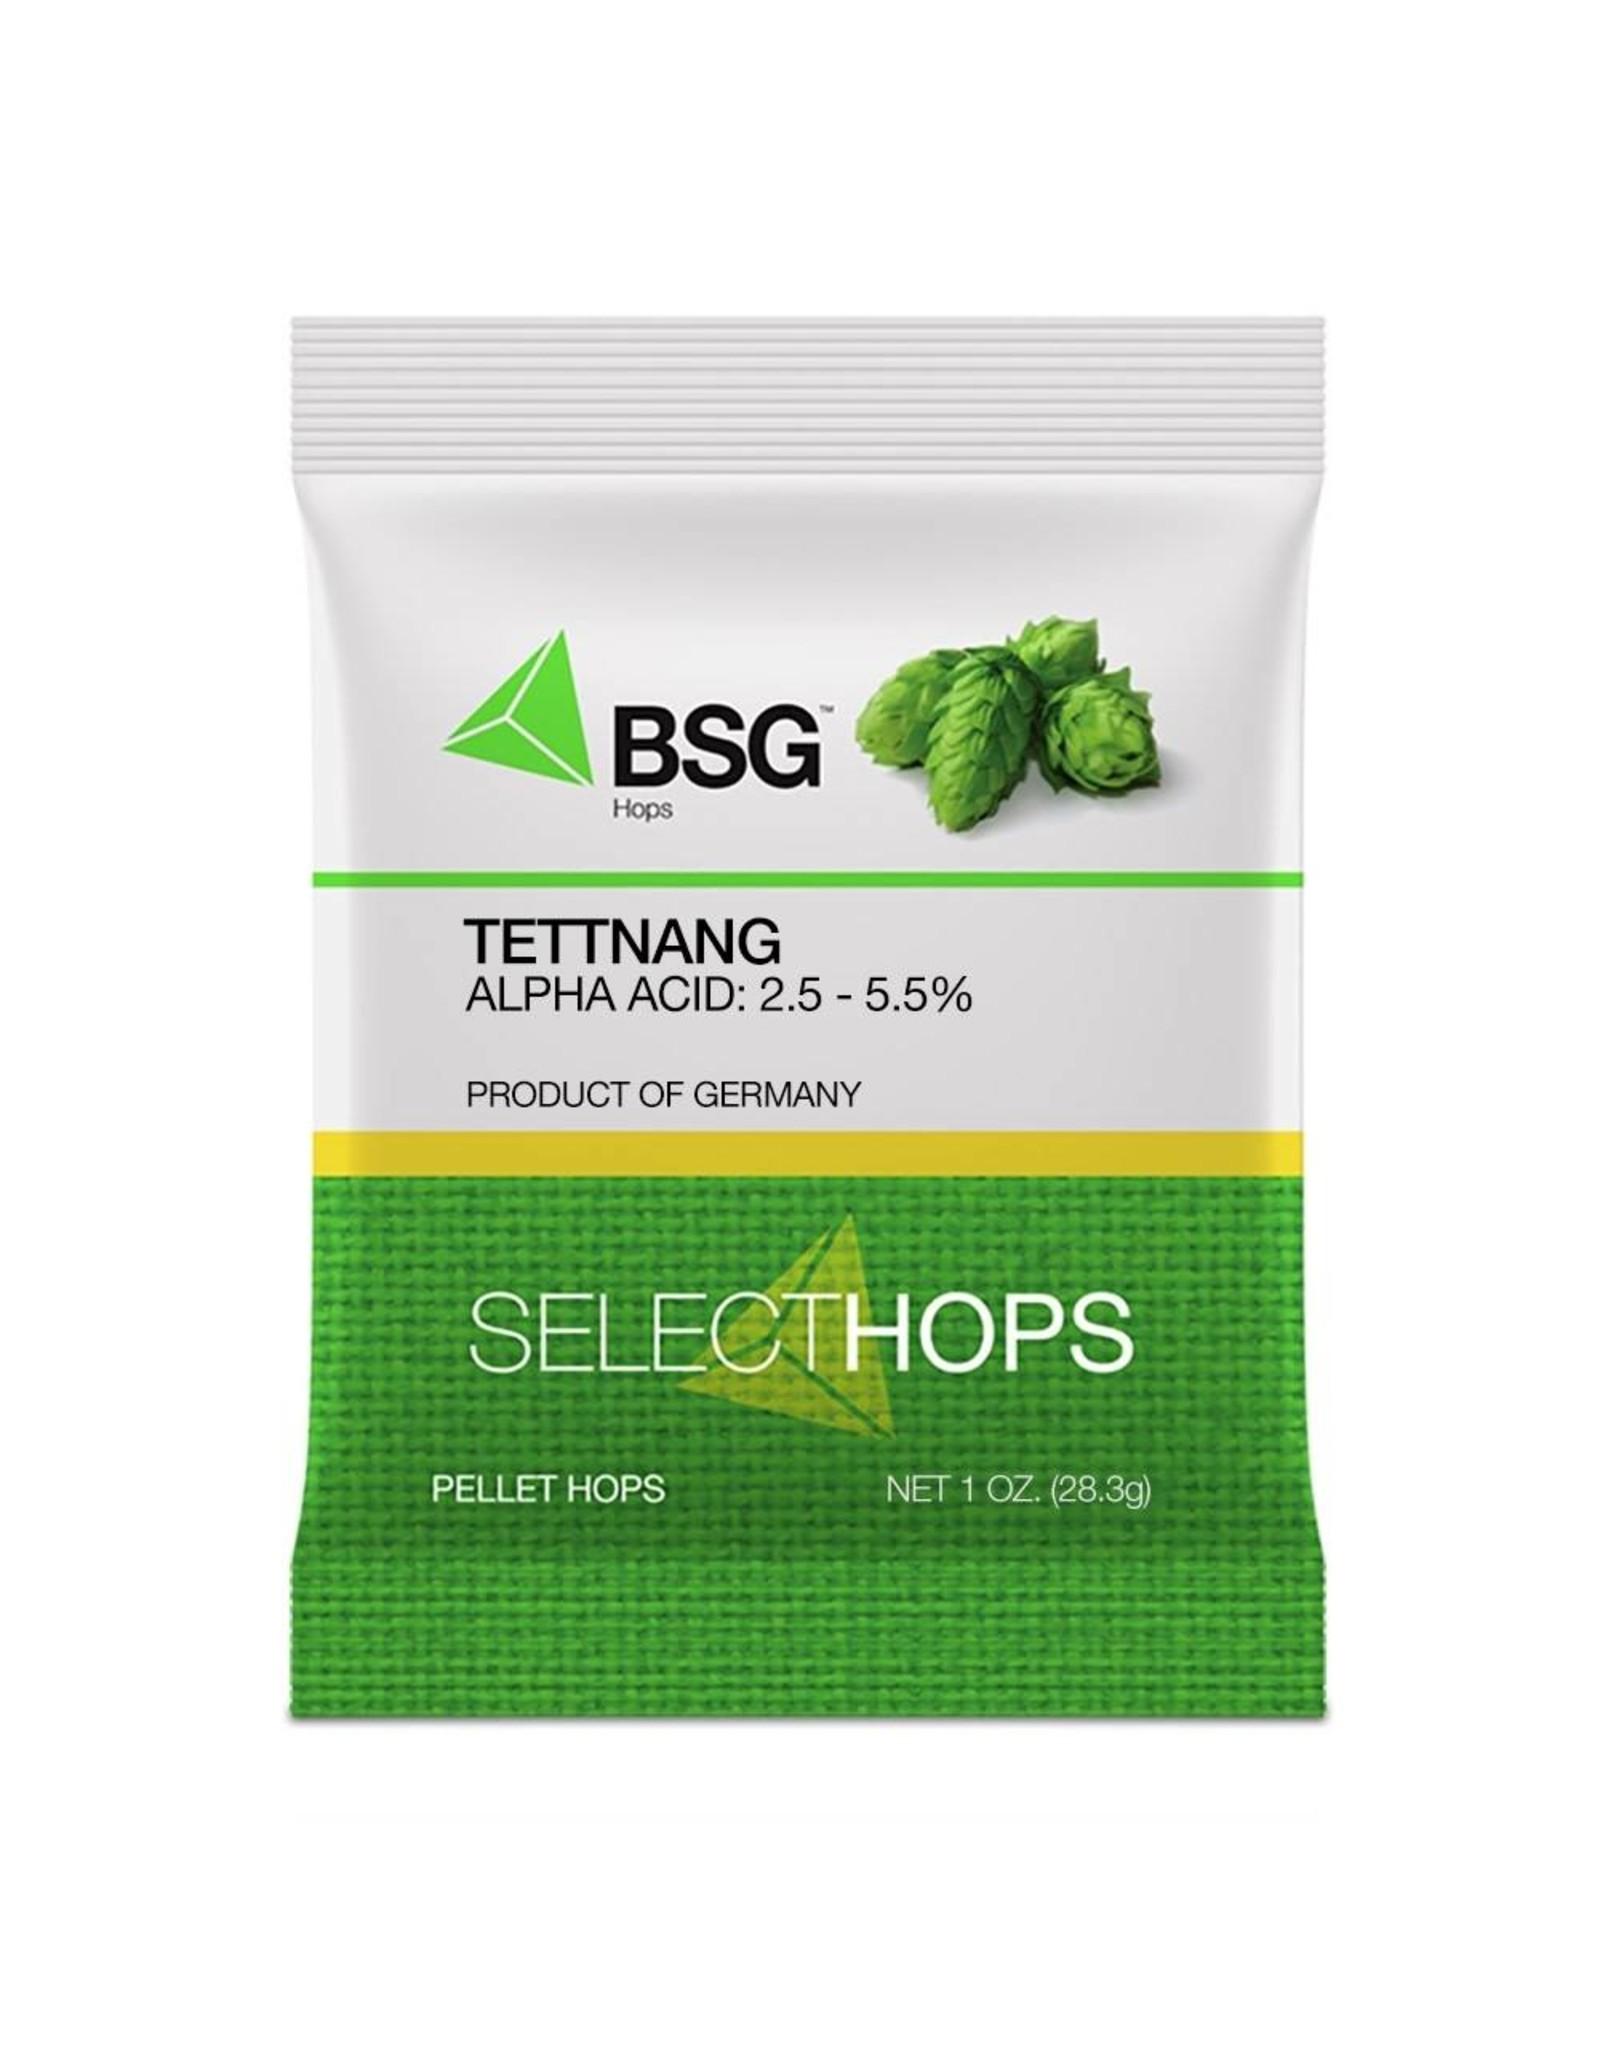 Tettnang (GE) Pellet Hops 1oz